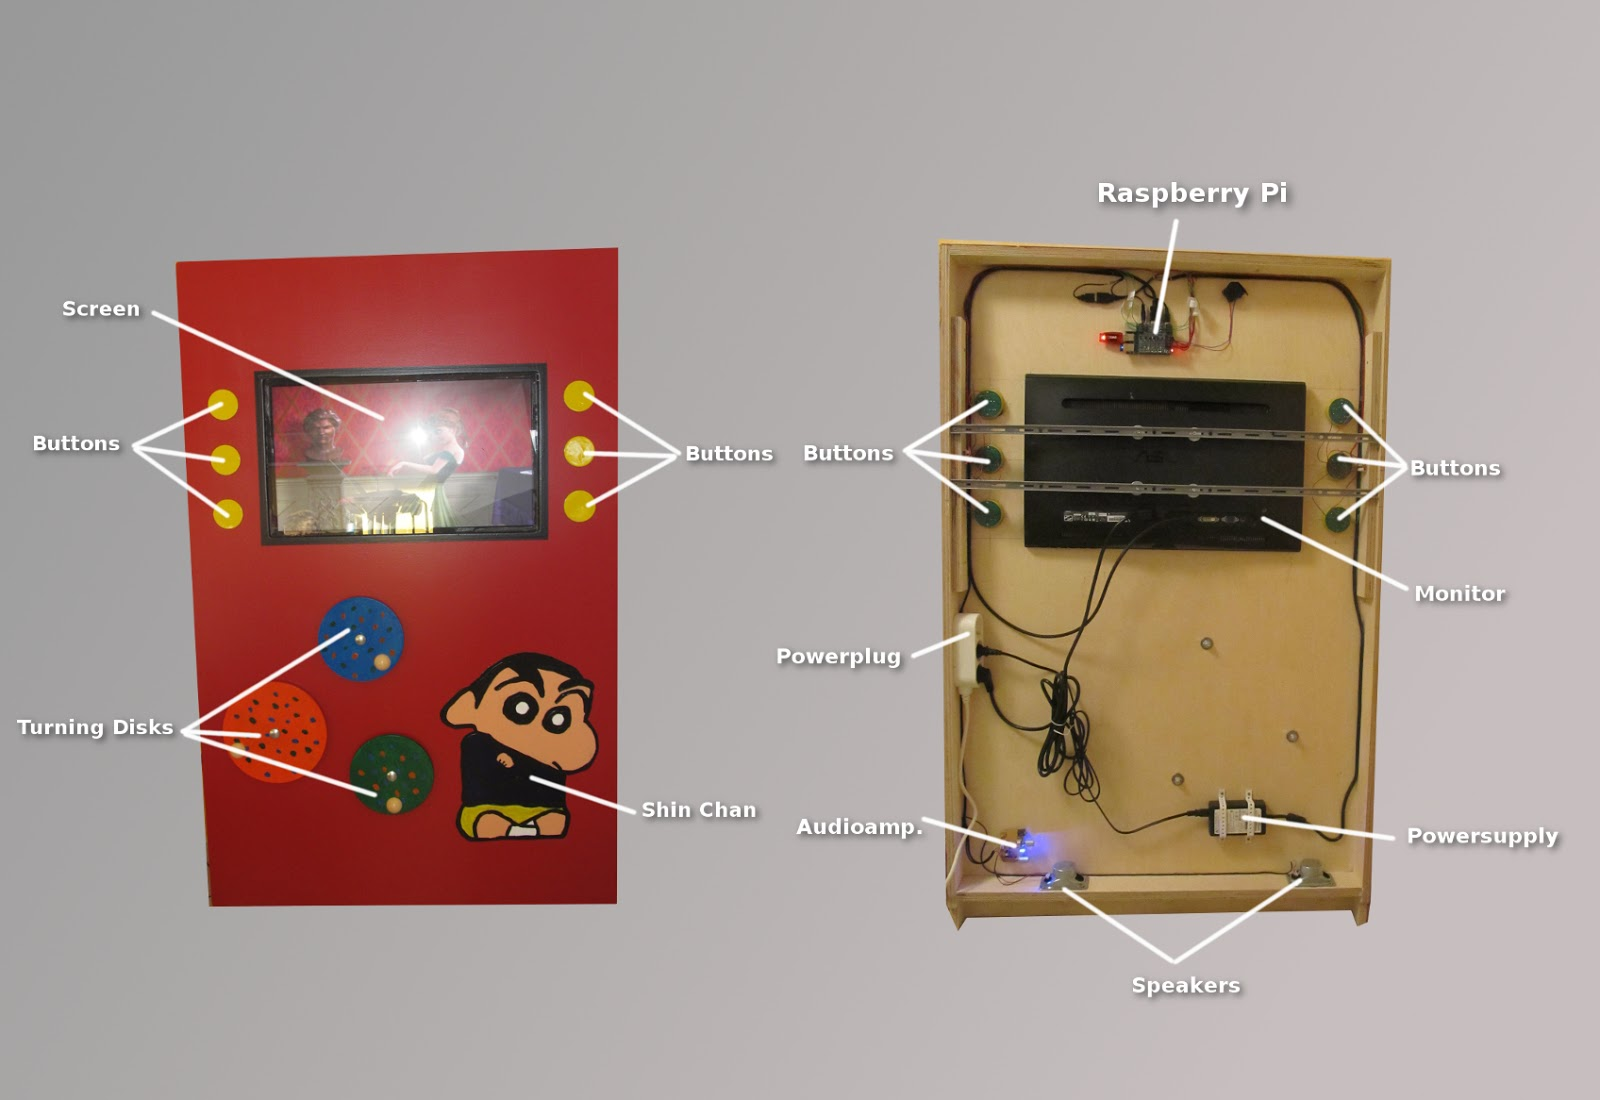 scott tv wiring diagrams scott small car stereo wiring diagram Snapper Wiring Diagram  Samsung TV Wiring Diagram Magnavox DVD VCR Wiring-Diagram Direct TV Wiring Guide